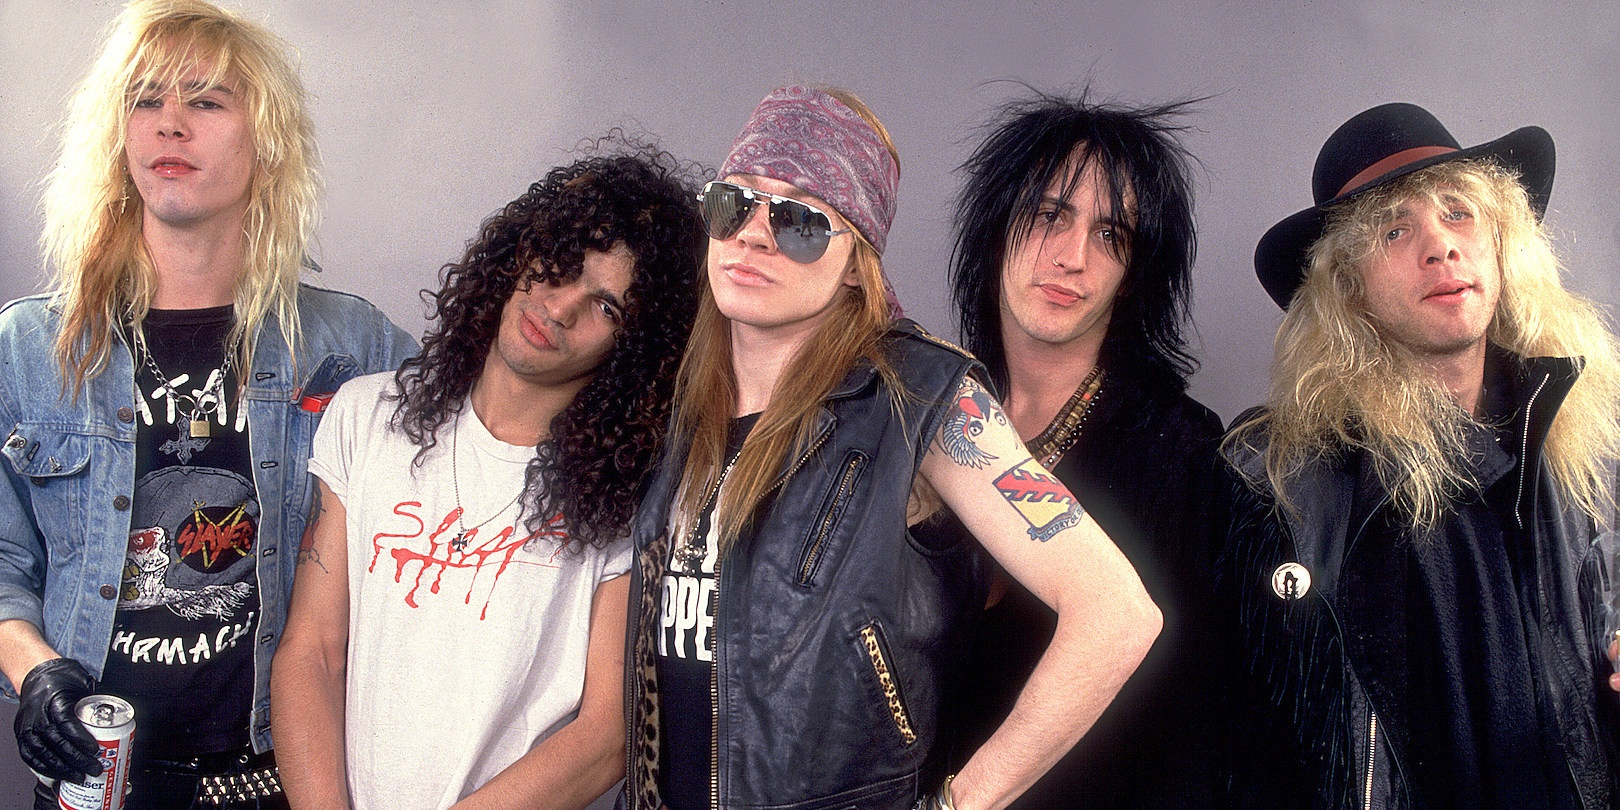 Guns N' Roses hint at new album